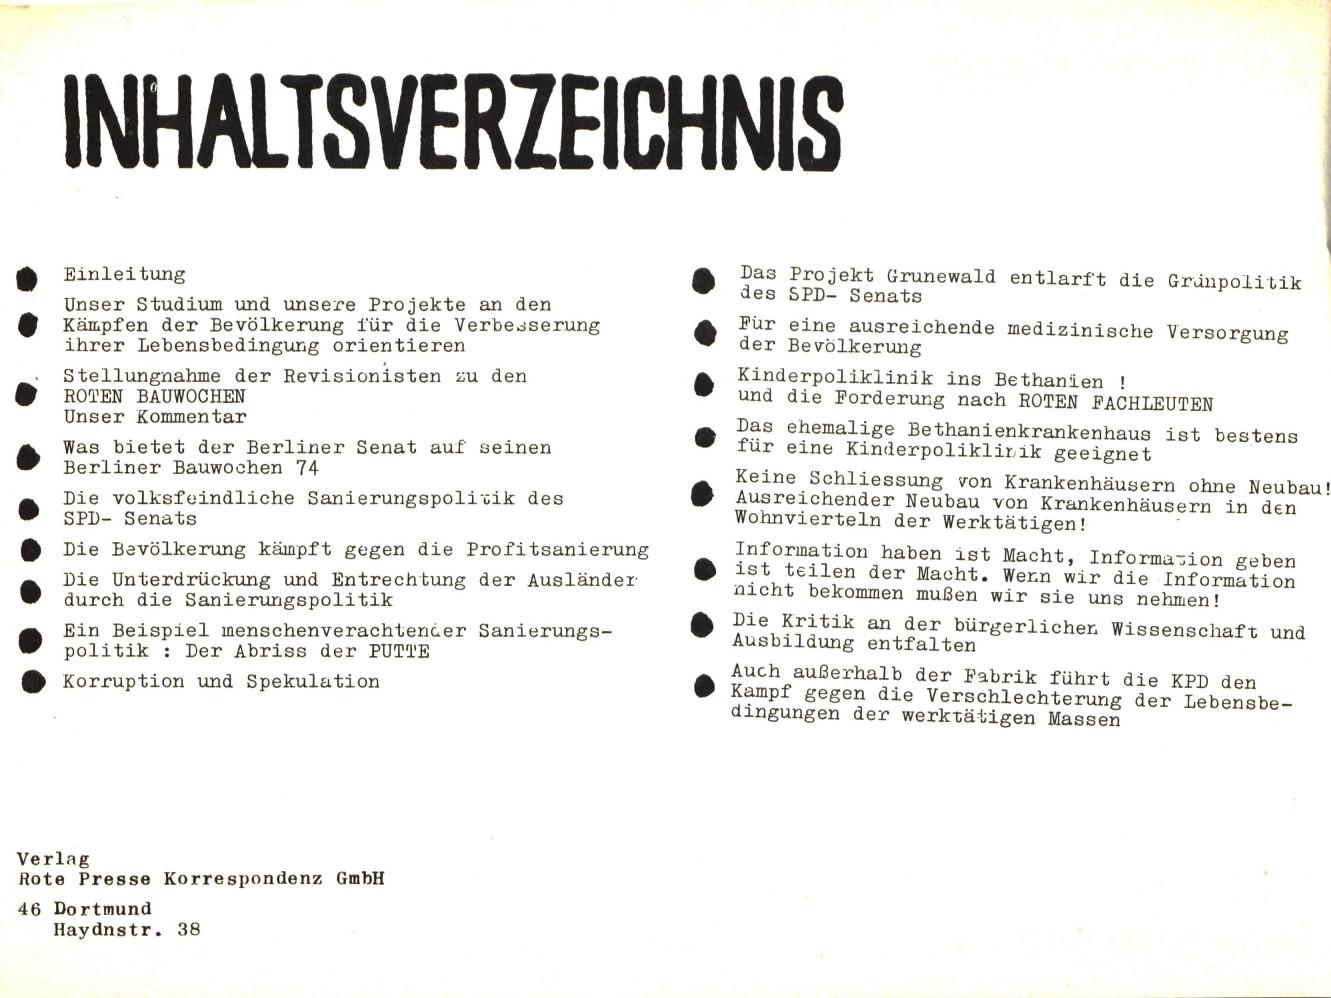 Berlin_KSV_1974_Rote_Bauwochen_04